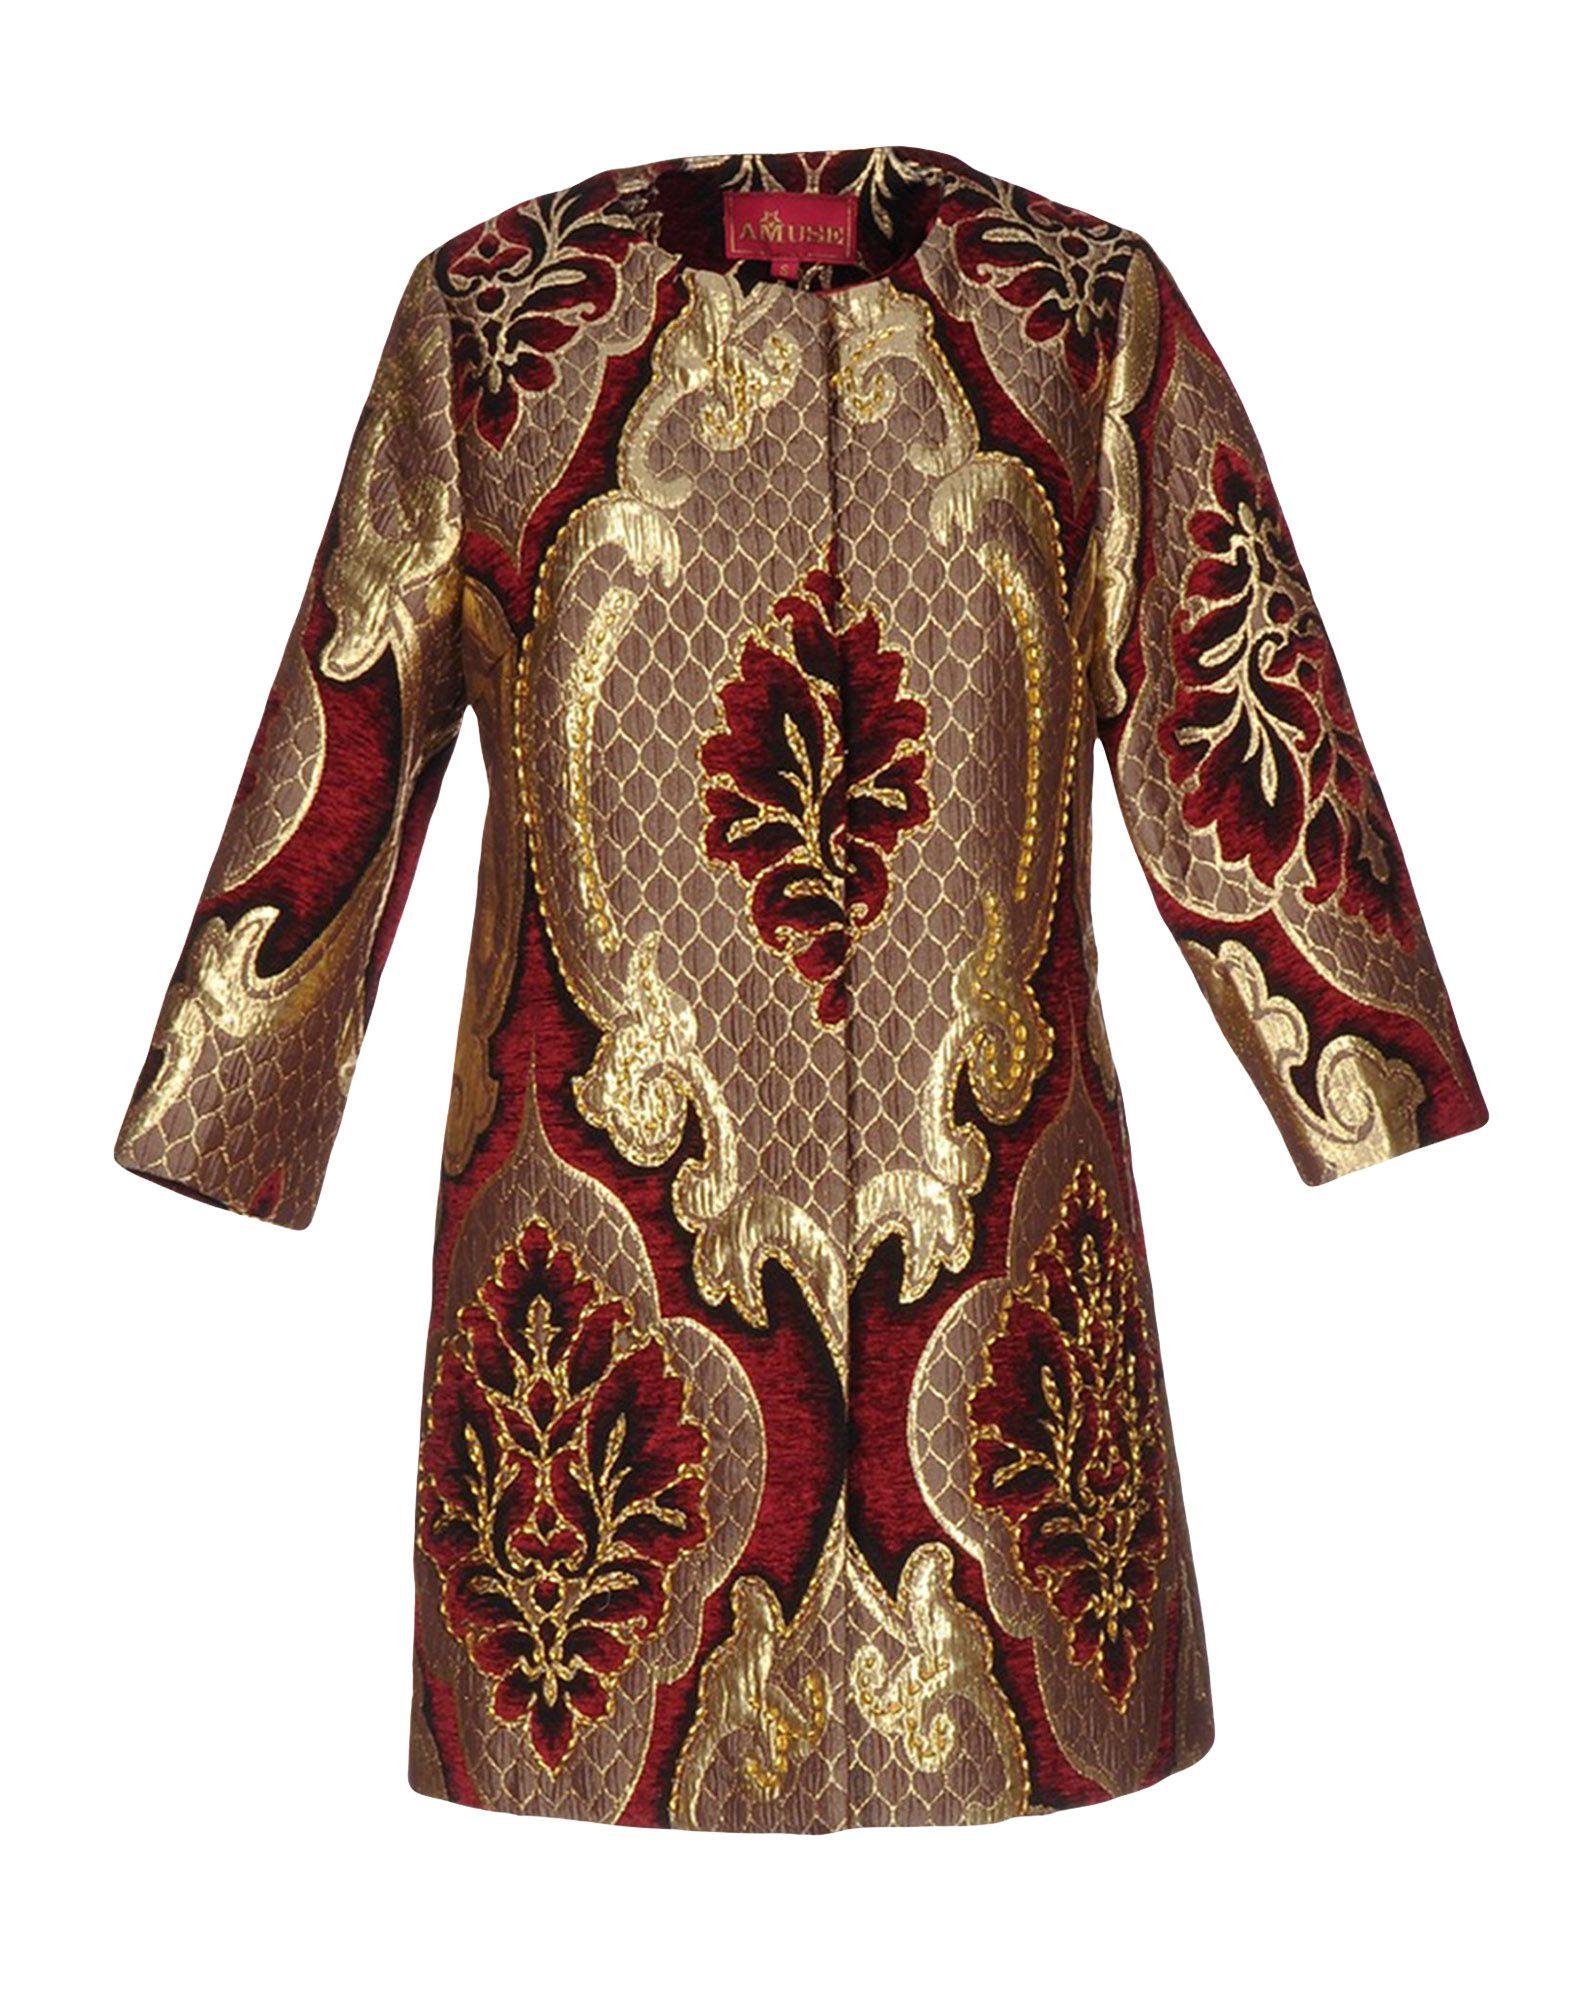 AMUSE Full-Length Jacket in Maroon